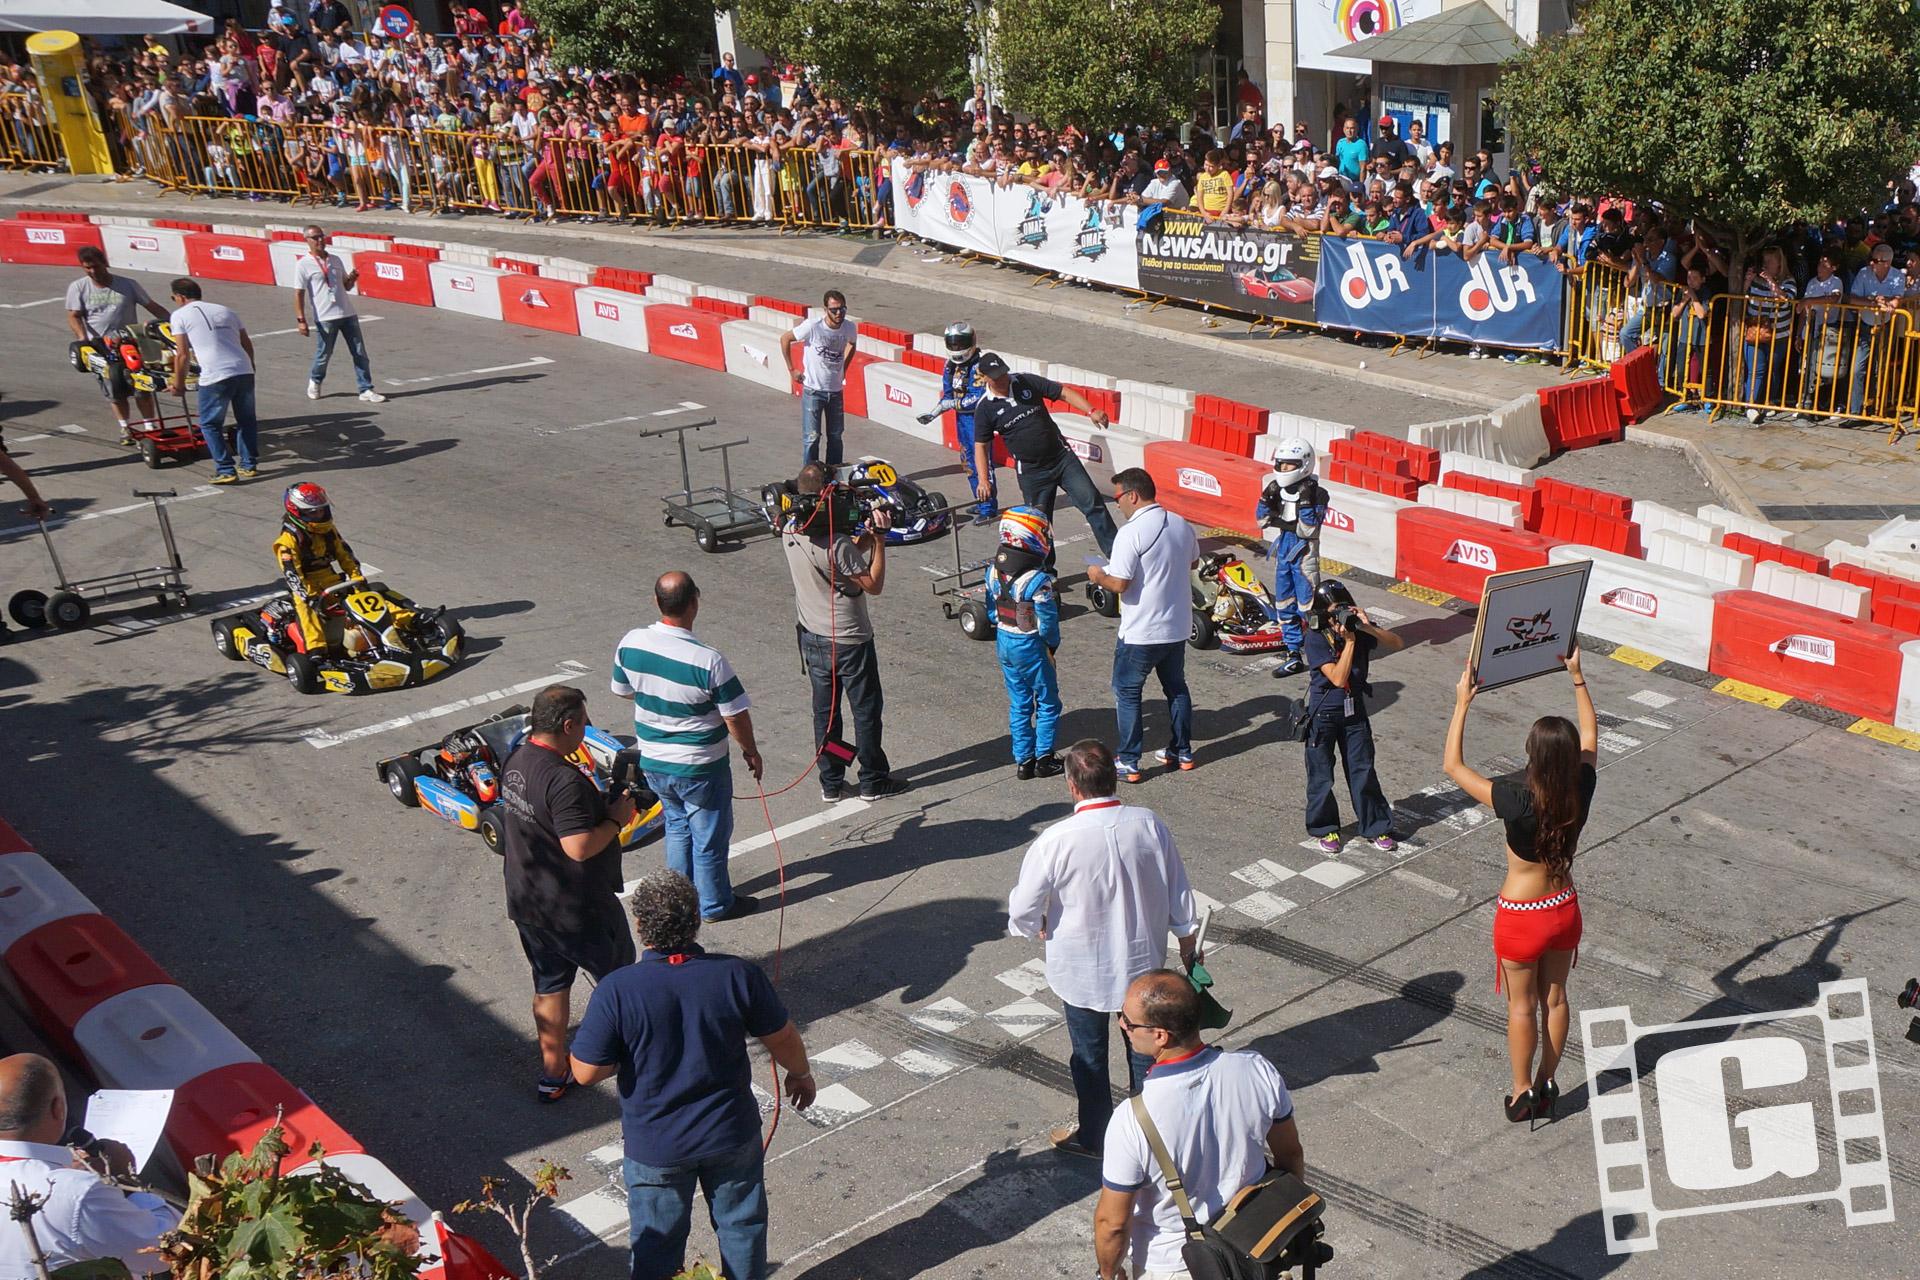 Pick Πάτρας Λουξ Cola, KART, patra, Chris Giatrakos, race